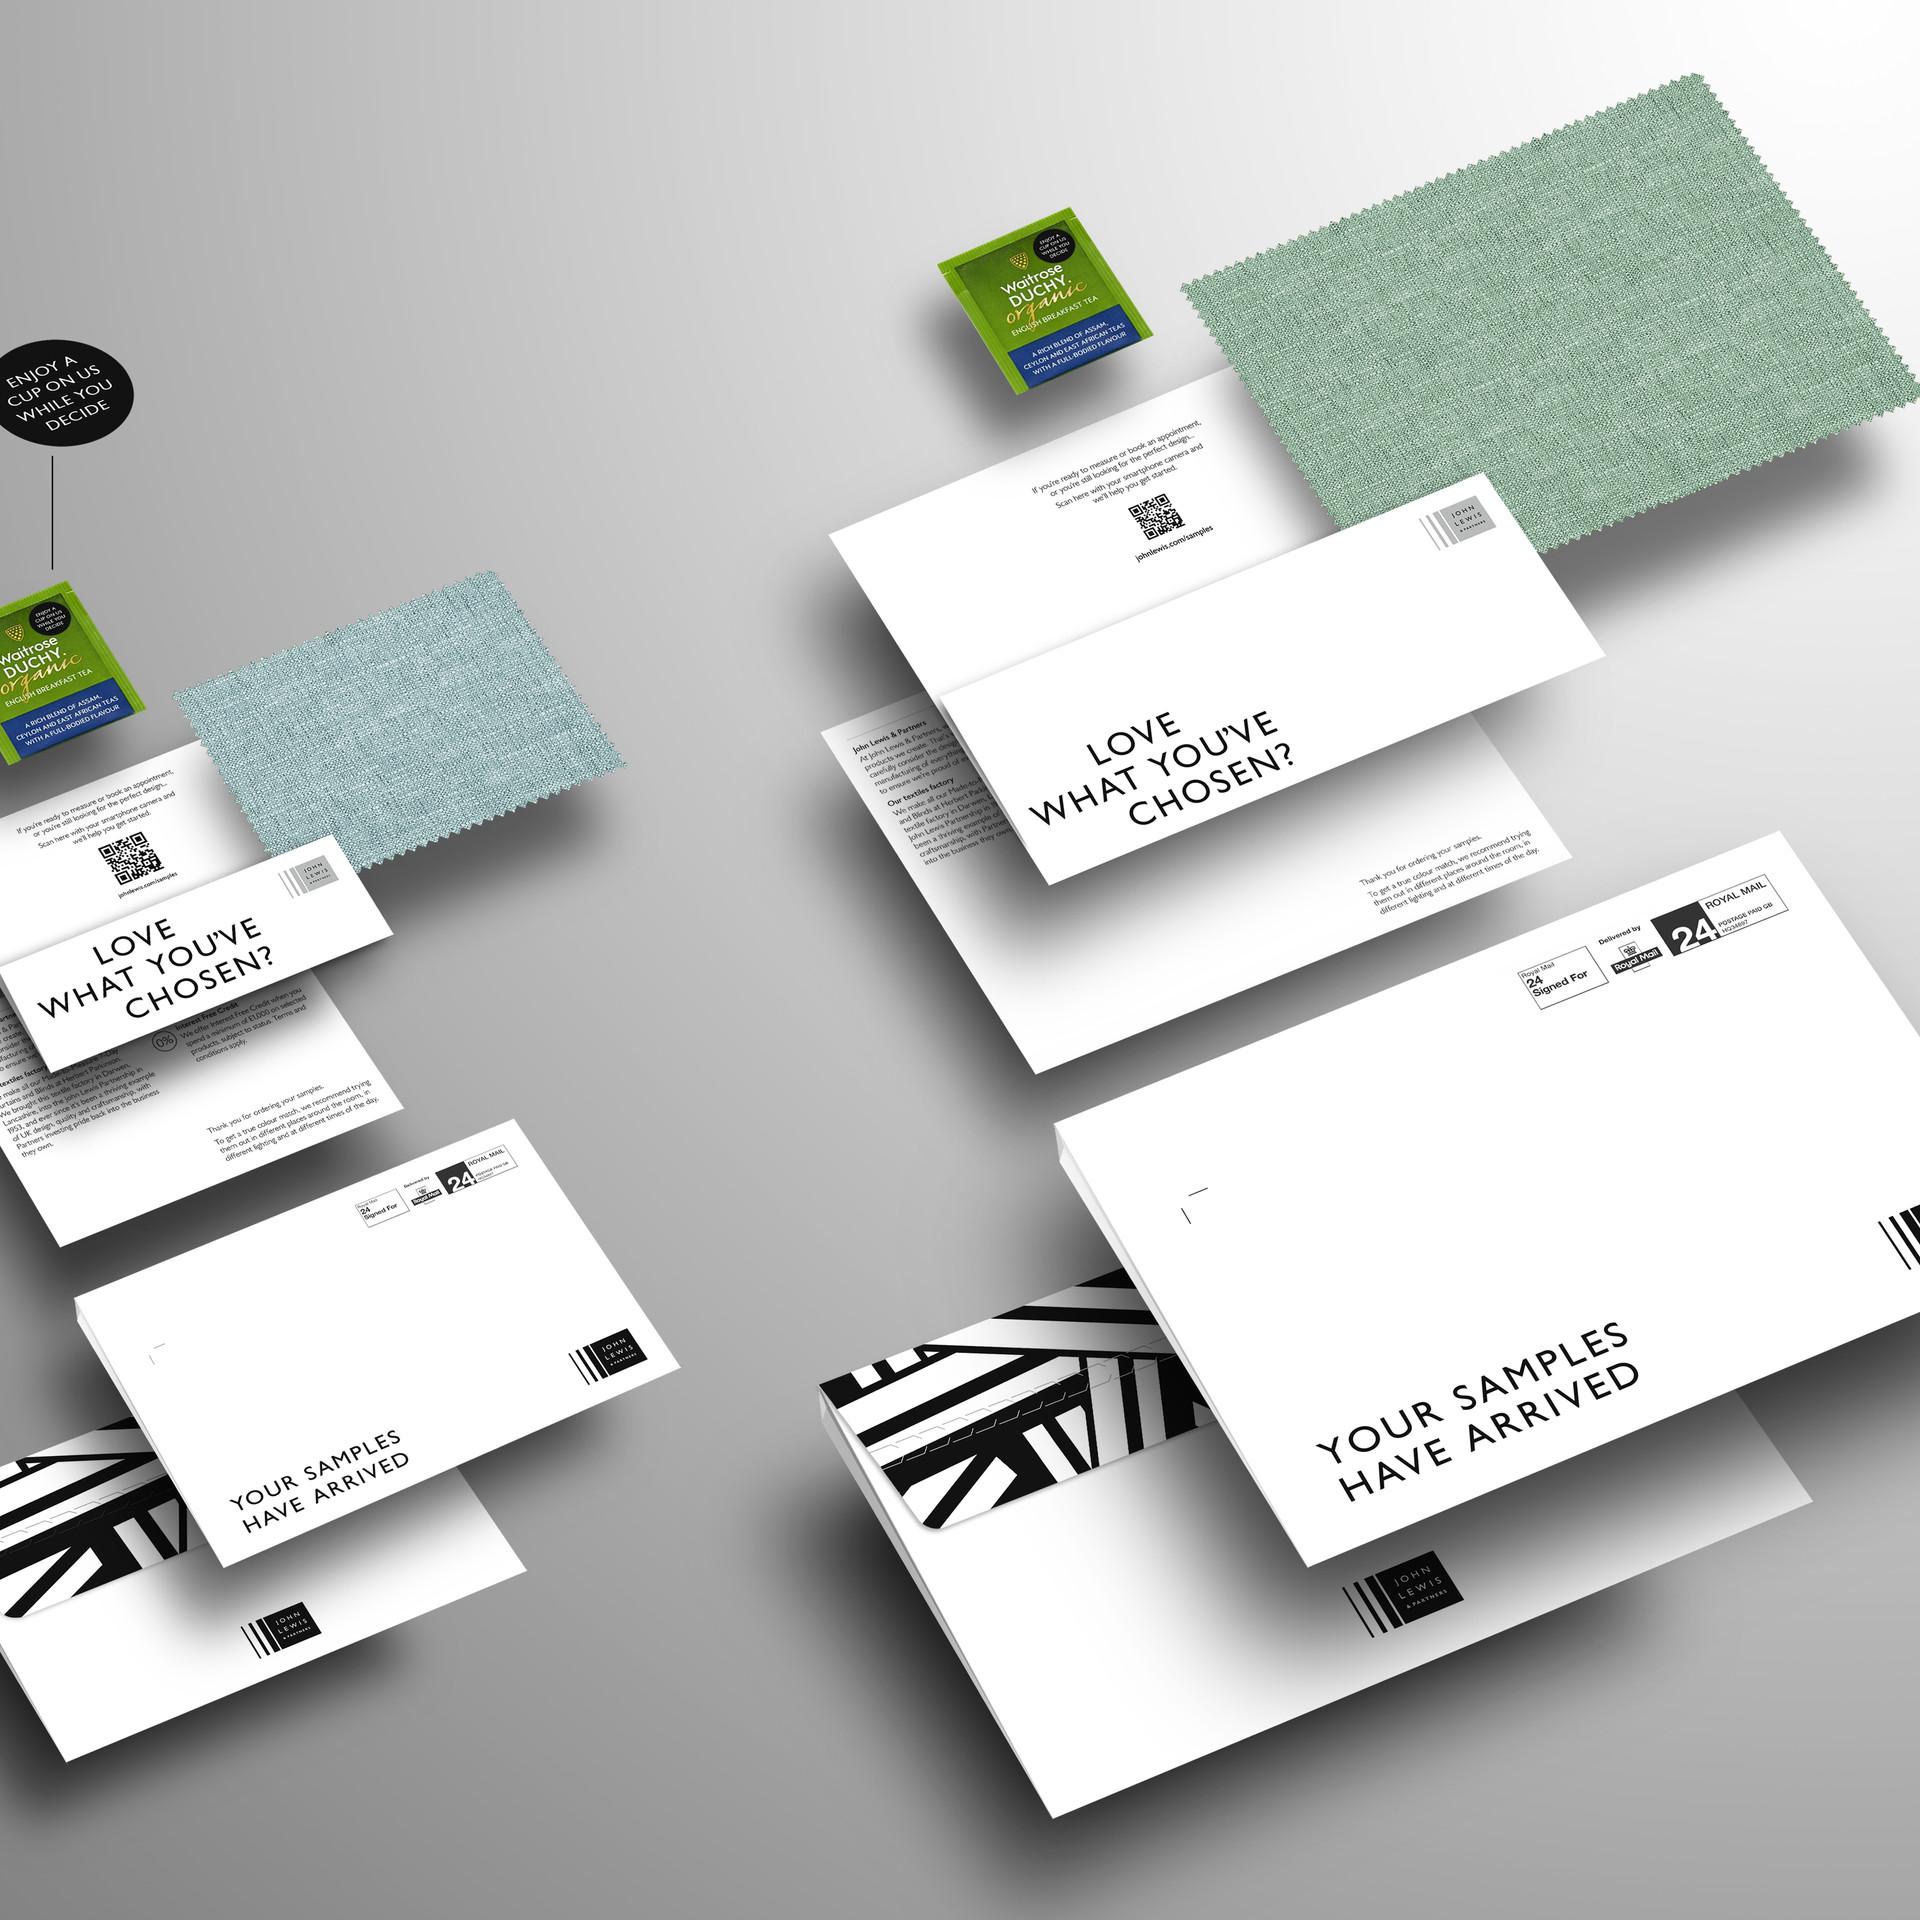 Sample pack mockup_JL Own Brand Fabrics_